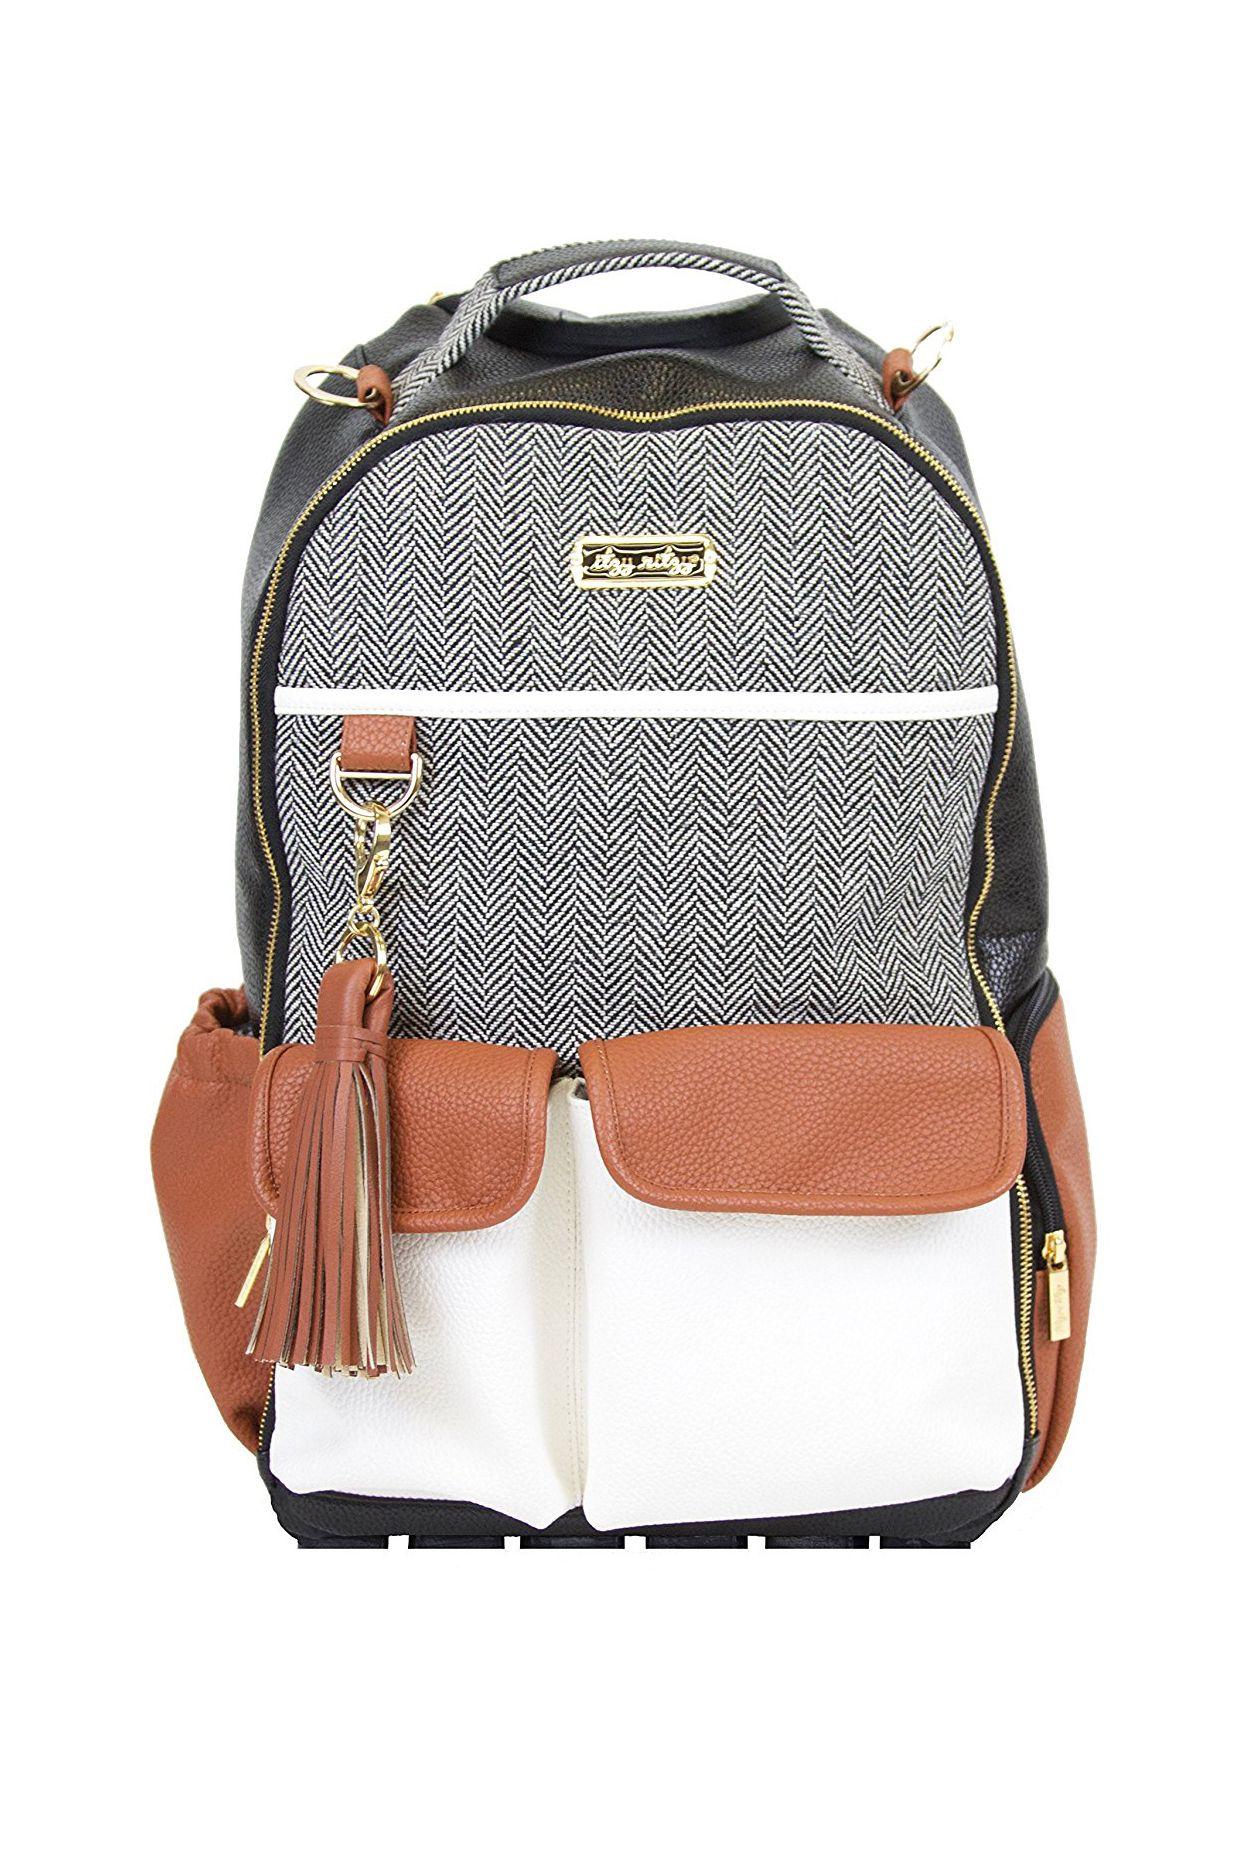 4282e650b8444 7 Best Backpack Diaper Bags - Top Rated Baby Backpack Diaper Bag Reviews